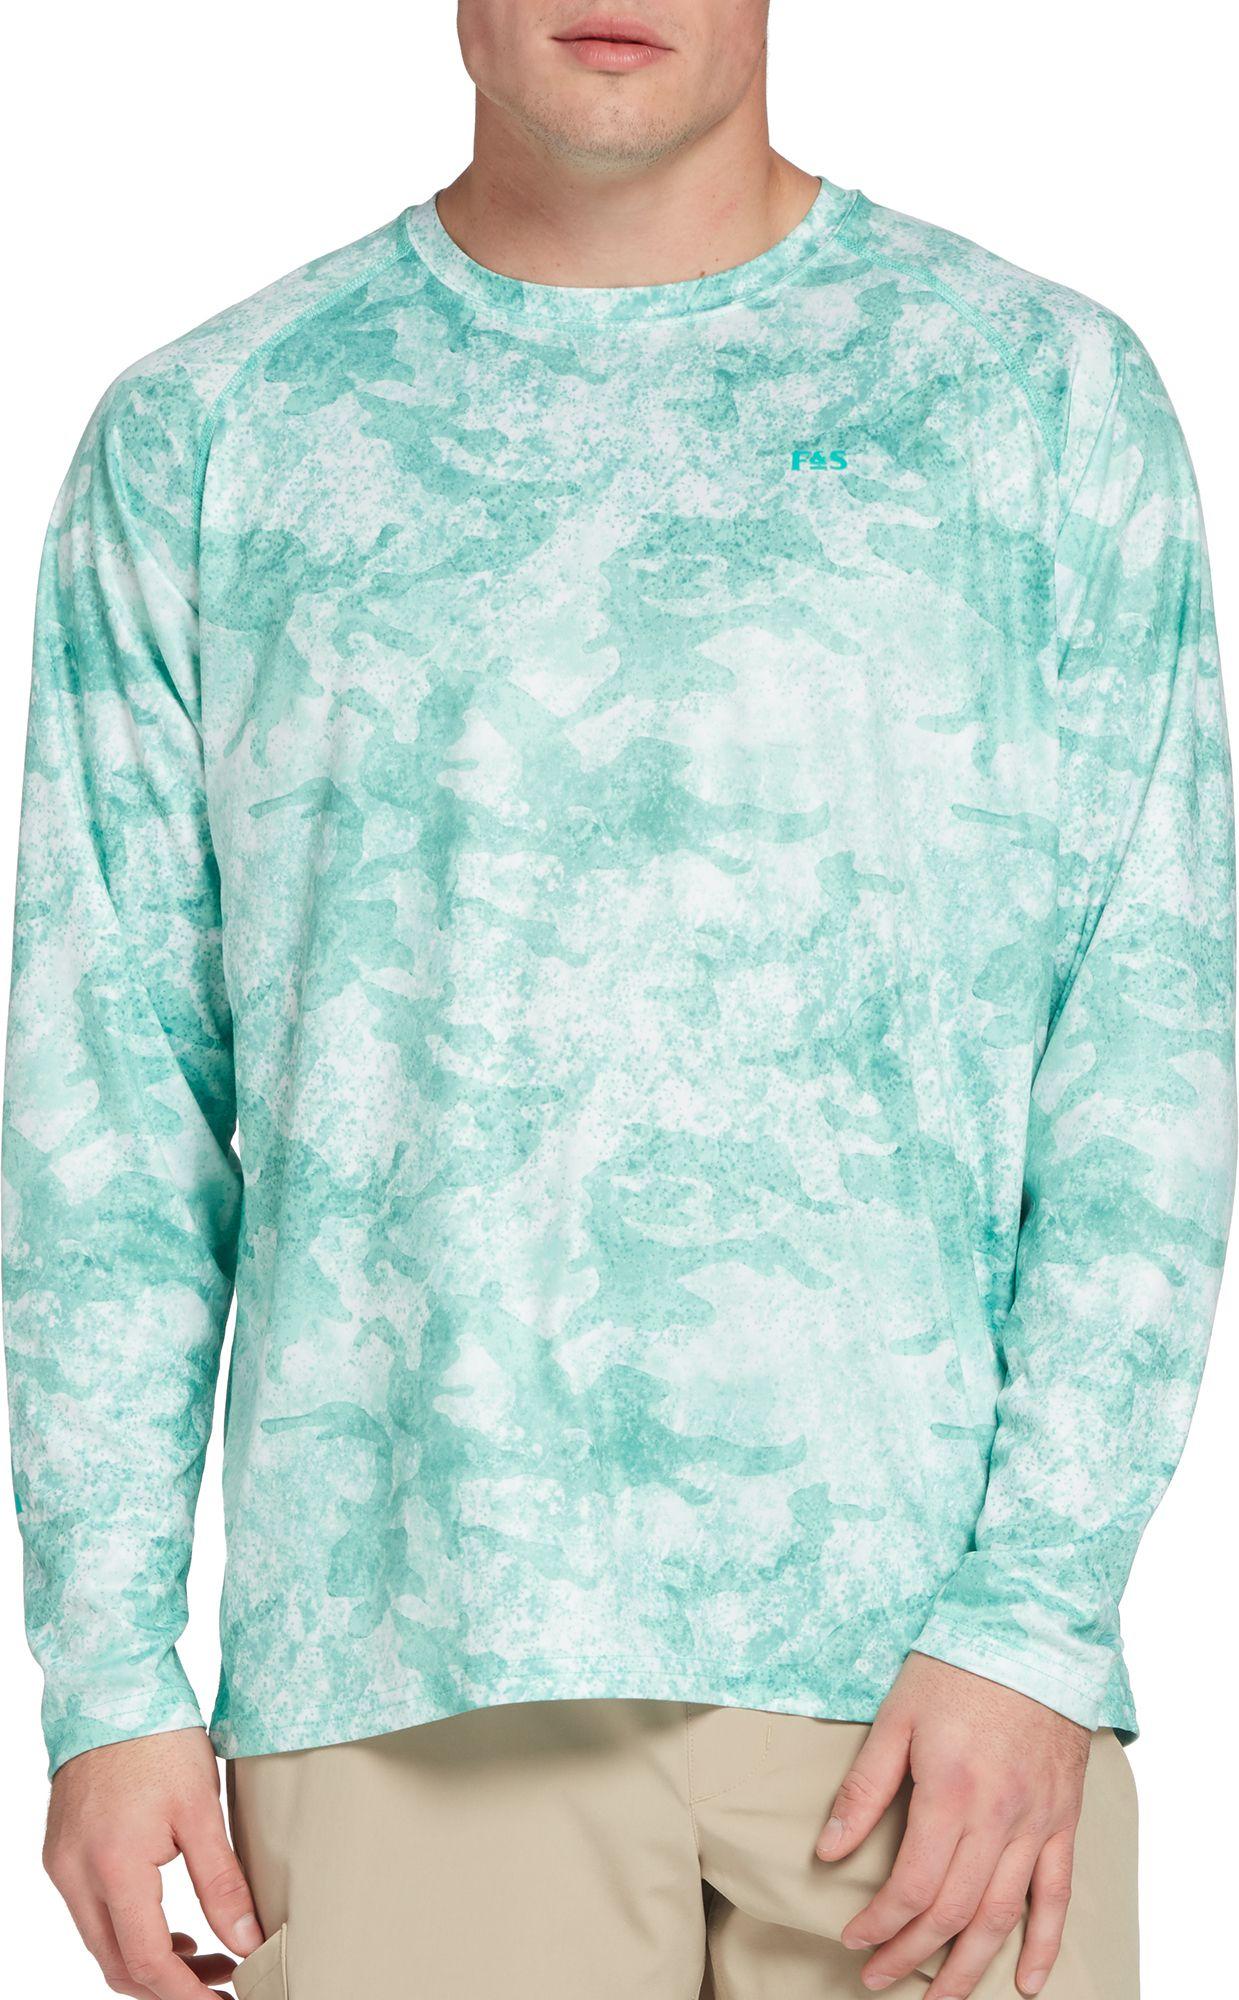 Field & Stream Men's Tech Printed Long Sleeve Shirt, Size: Small, Green